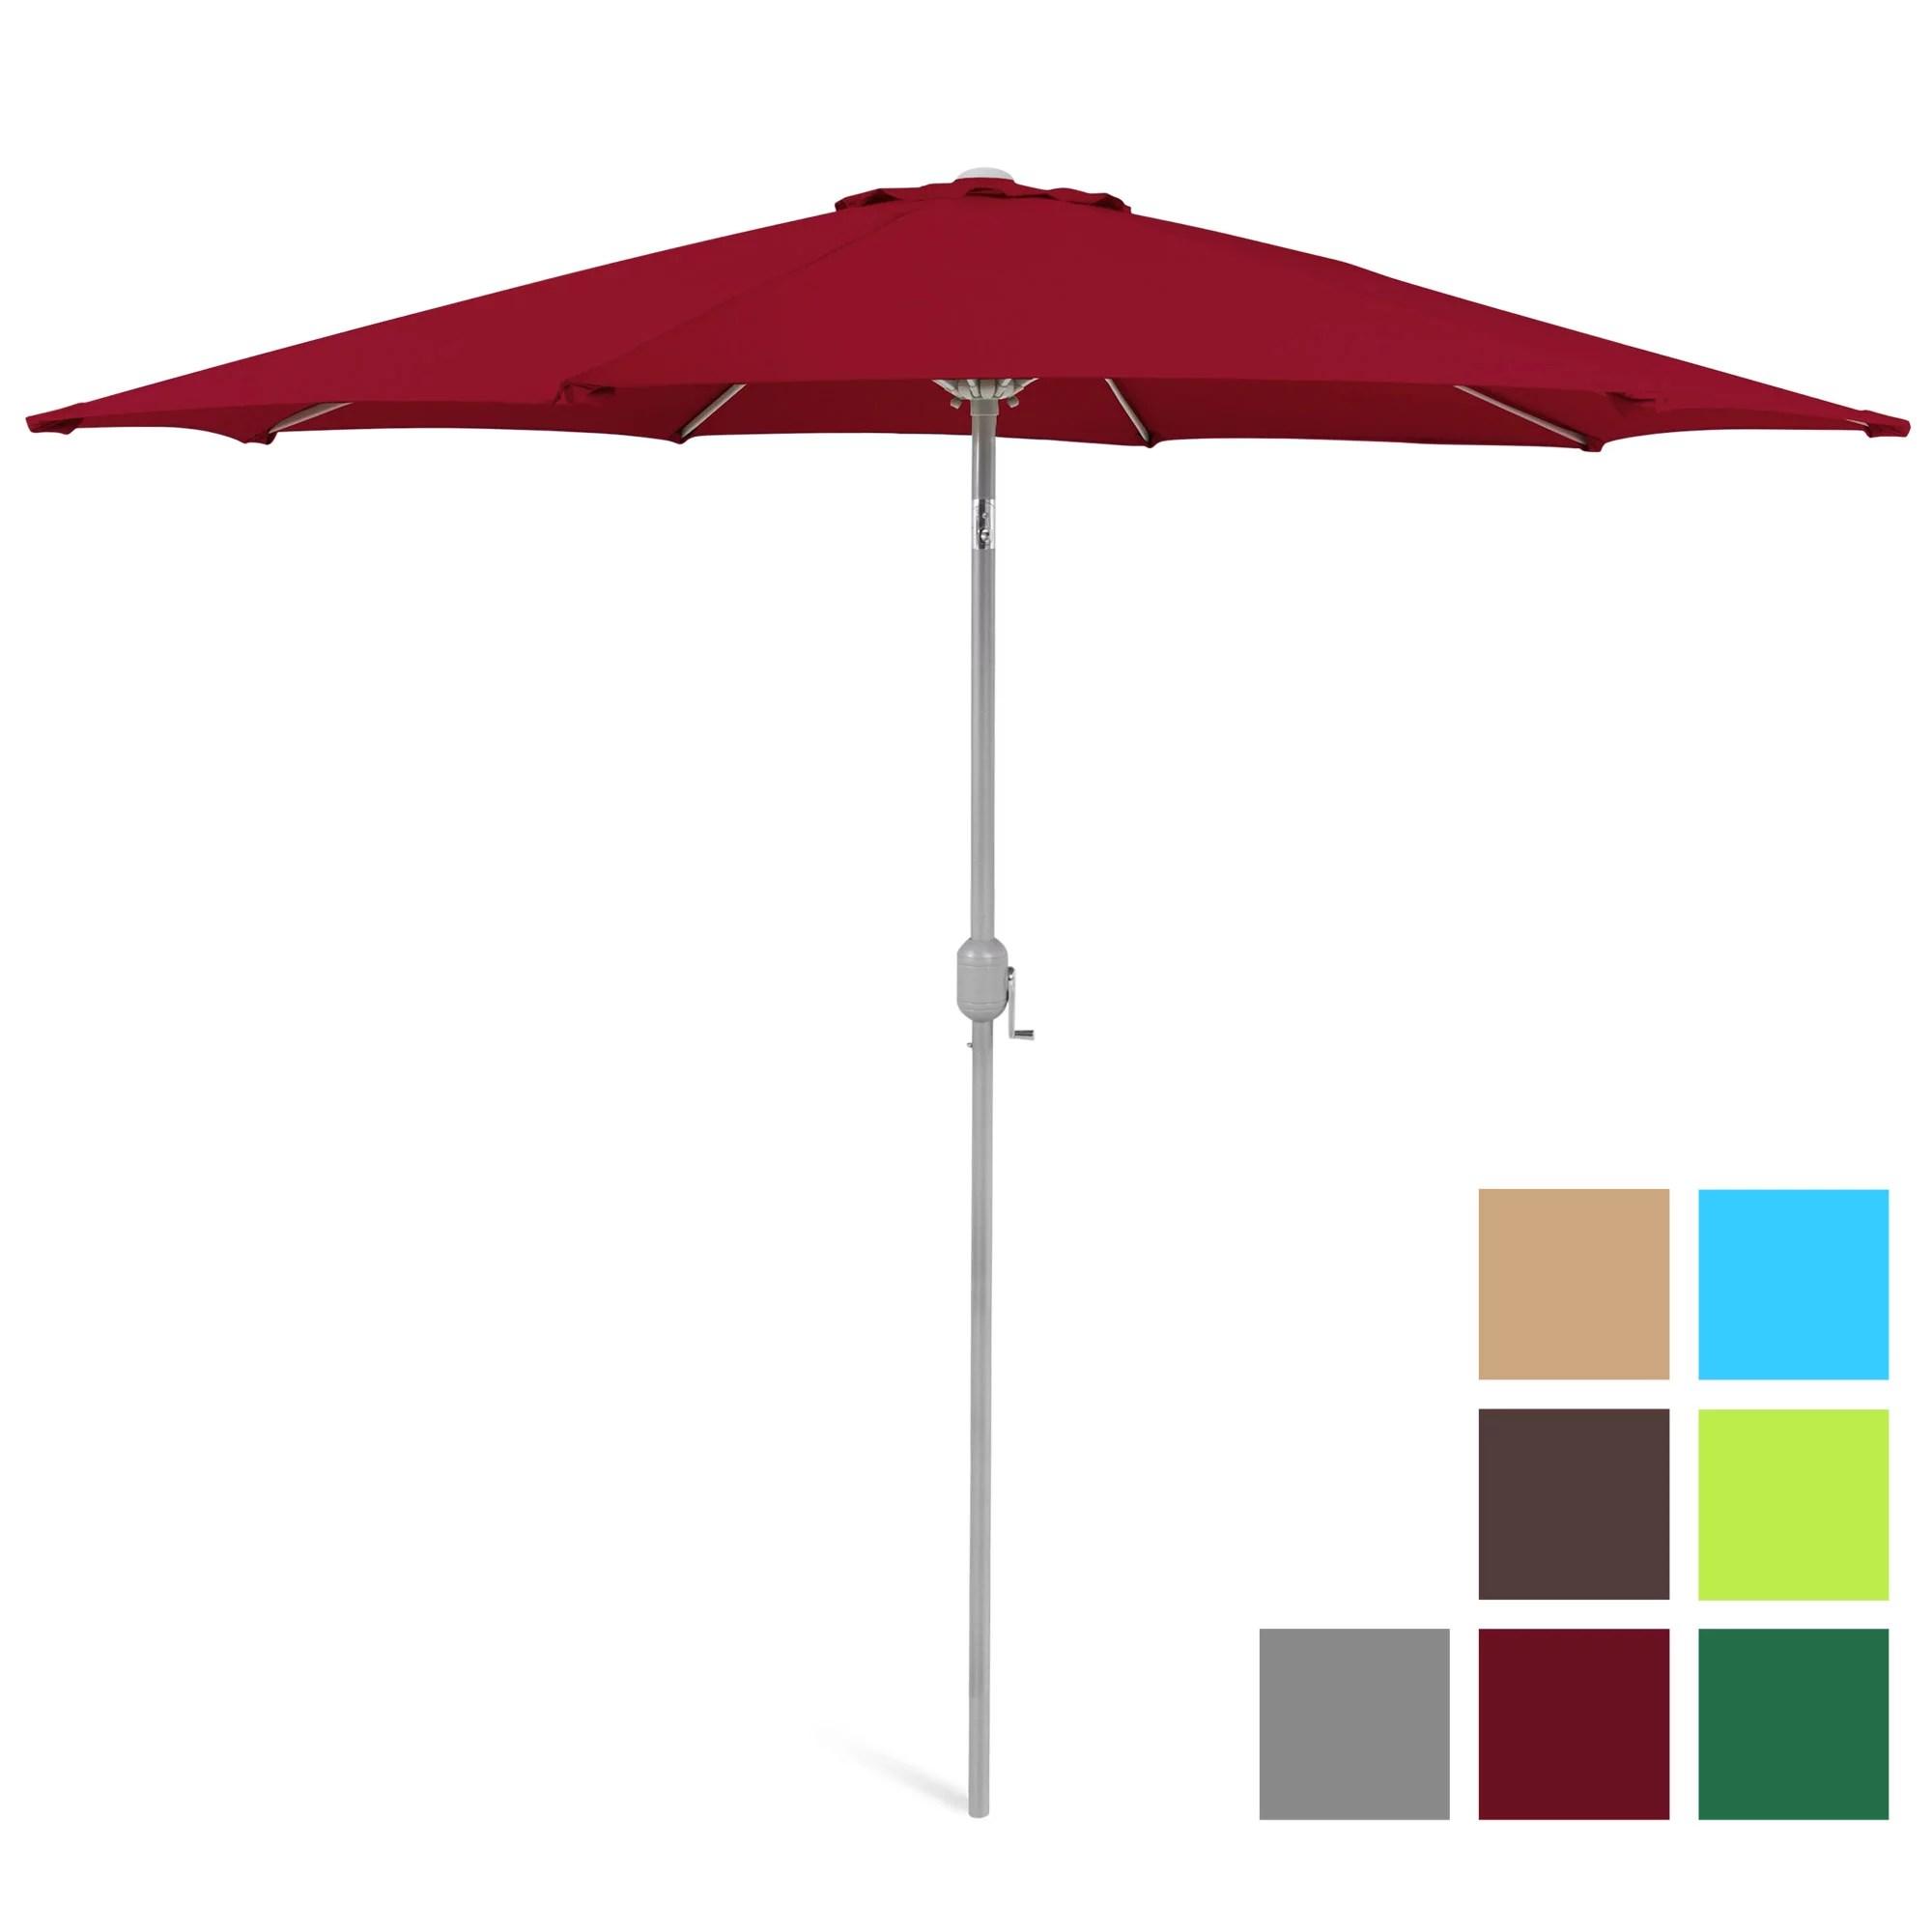 best choice products 9ft outdoor market patio umbrella w crank tilt wind vent 1 5in diameter pole red